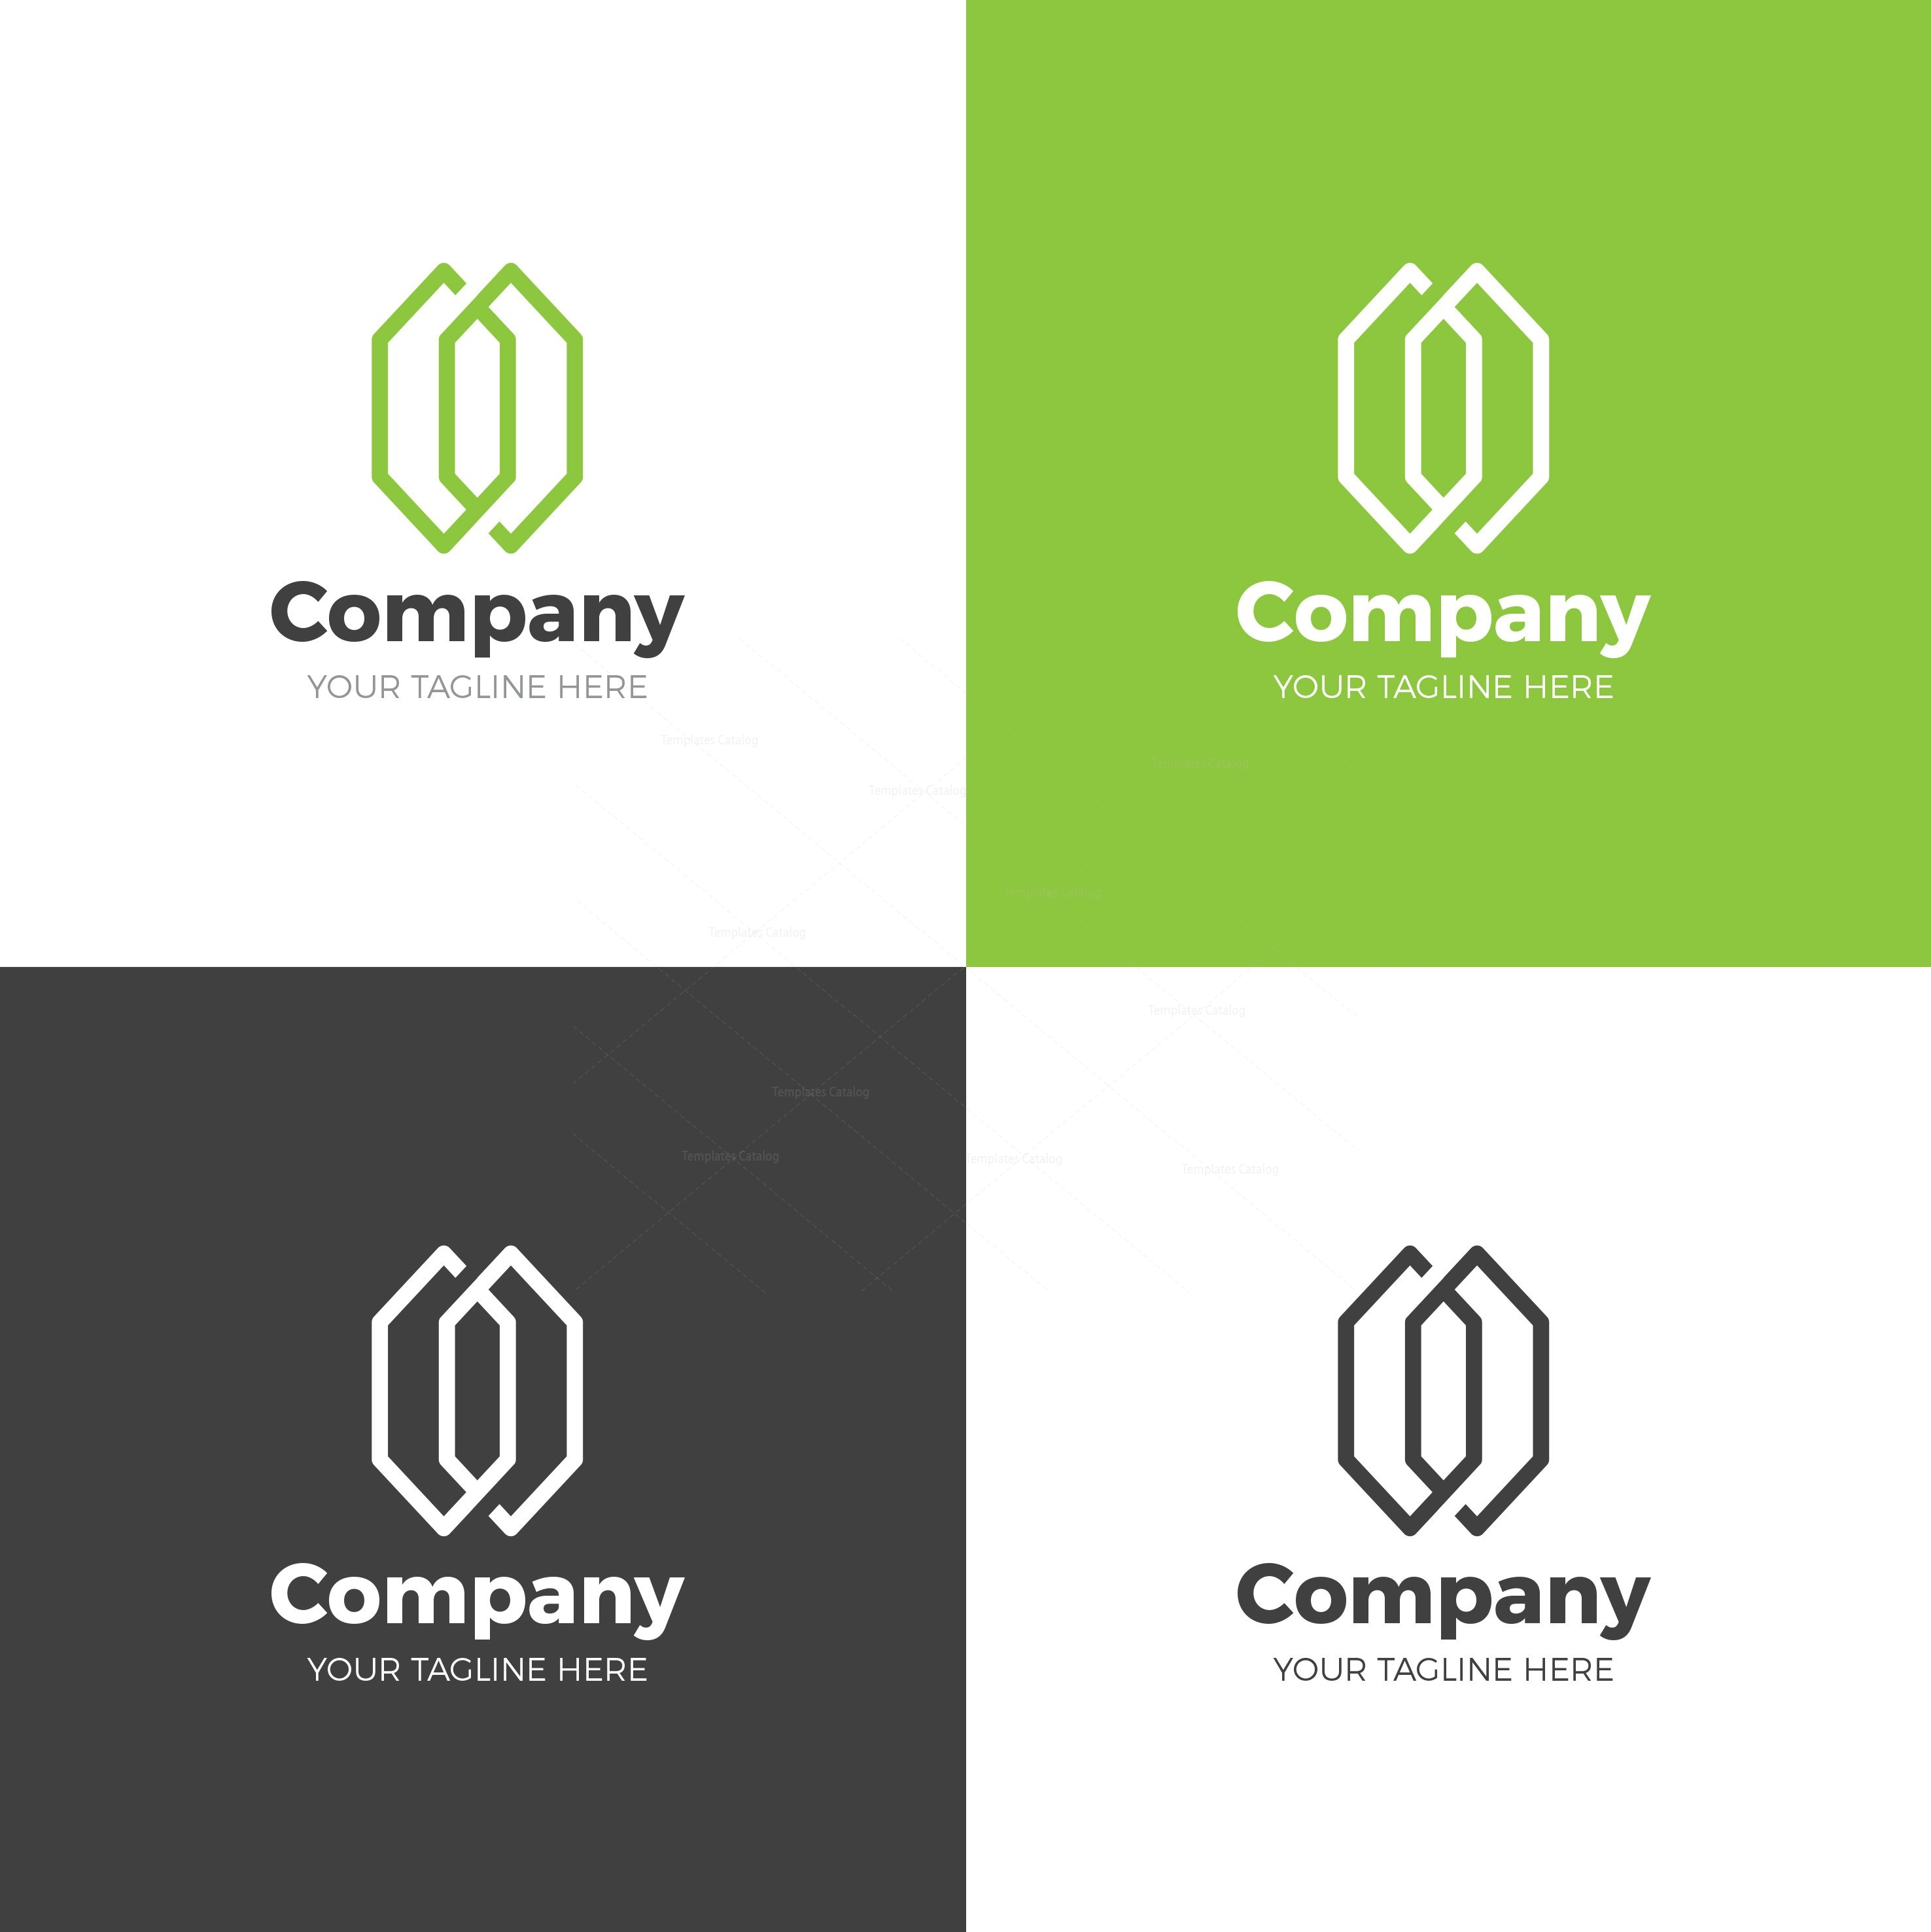 Simple Creative Logo Design Template Graphic Templates,Minimalist Kitchen Design Black